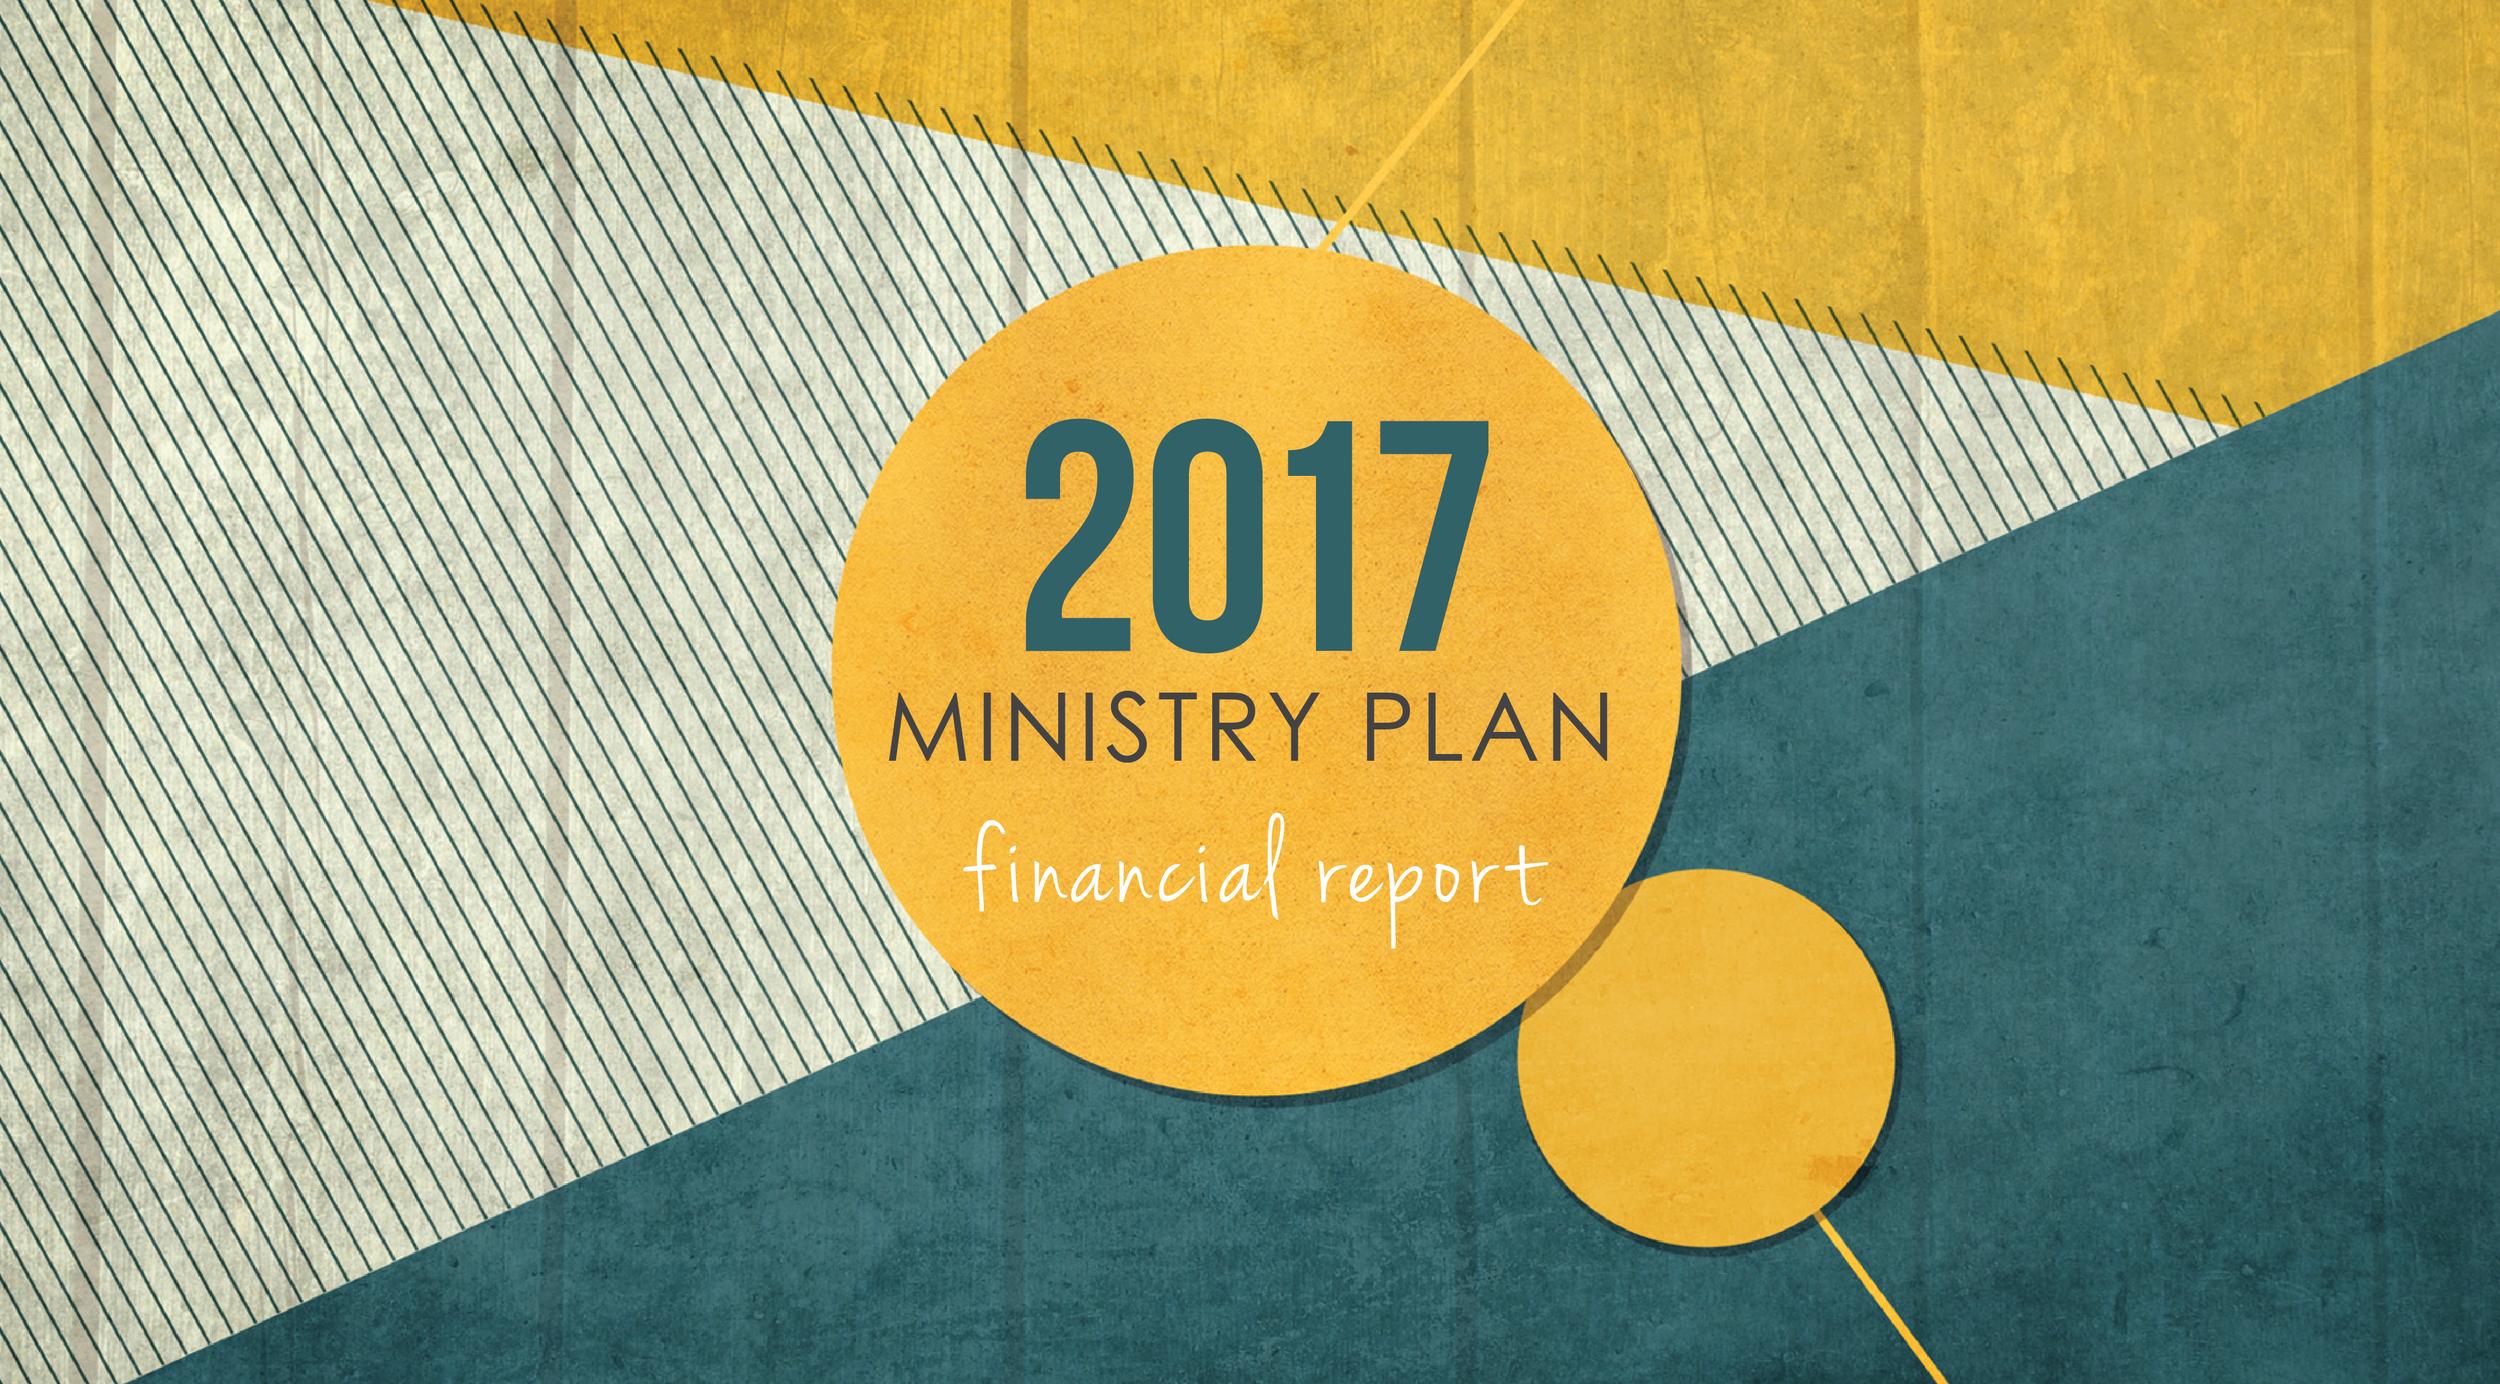 2017 Ministry Plan